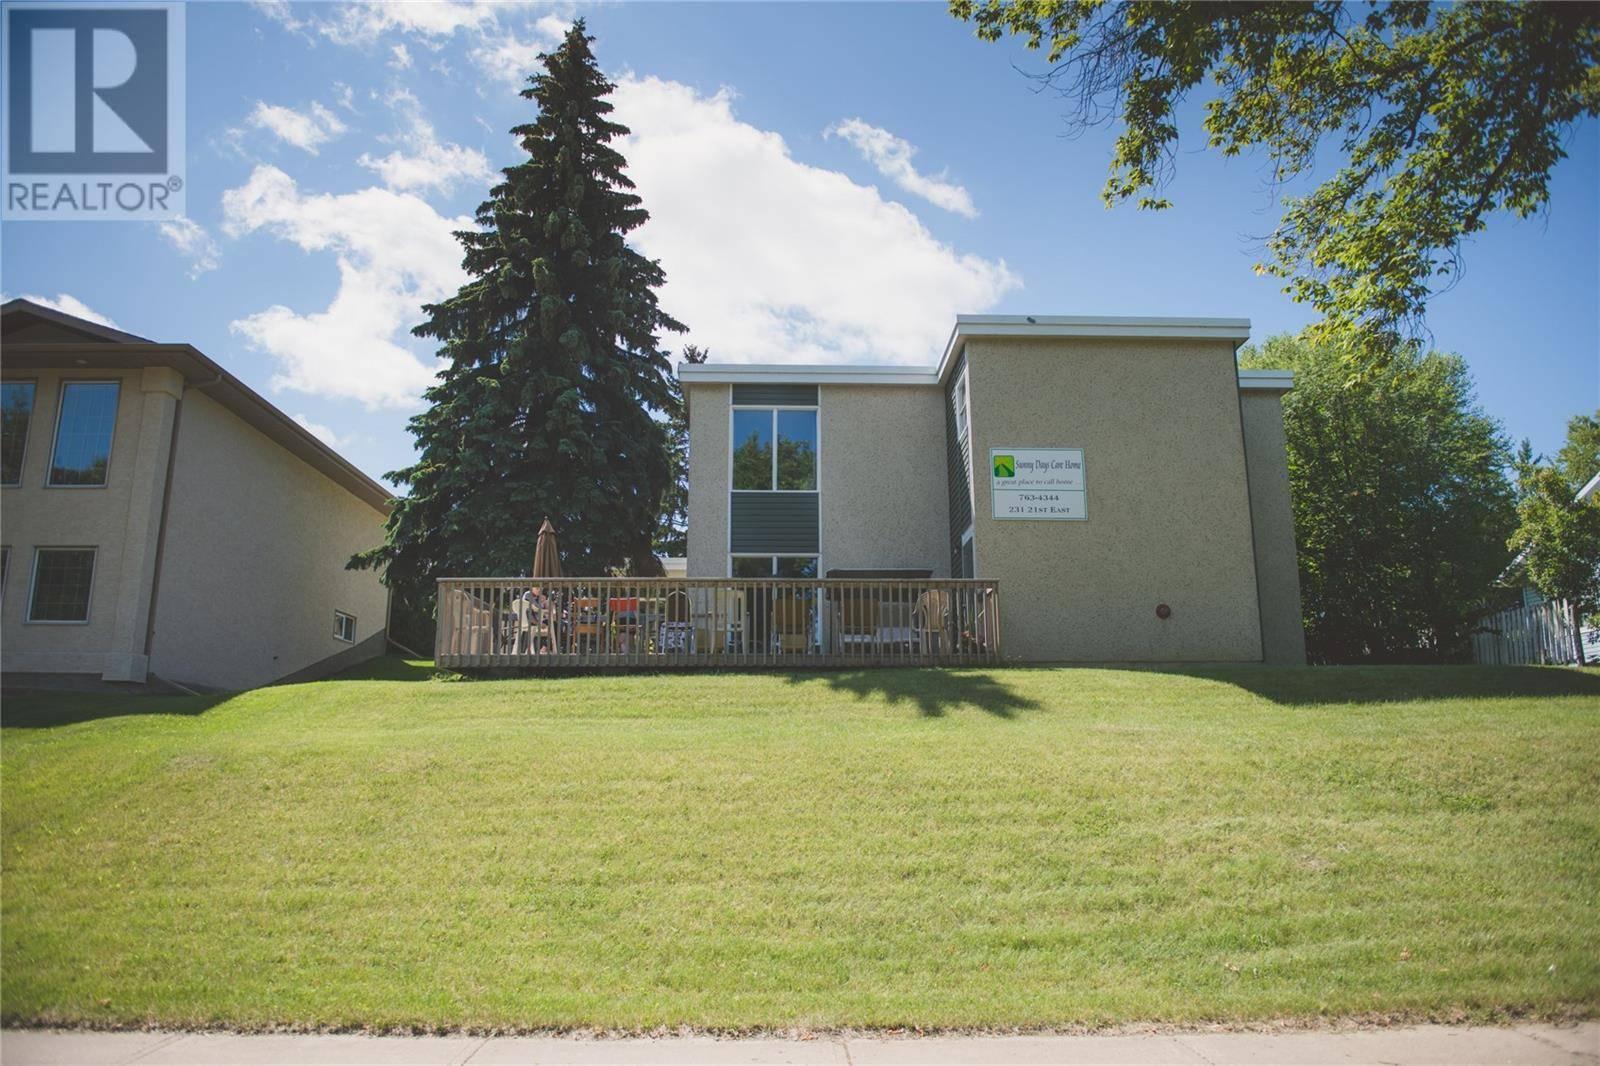 House for sale at 231 21st St E Prince Albert Saskatchewan - MLS: SK758793